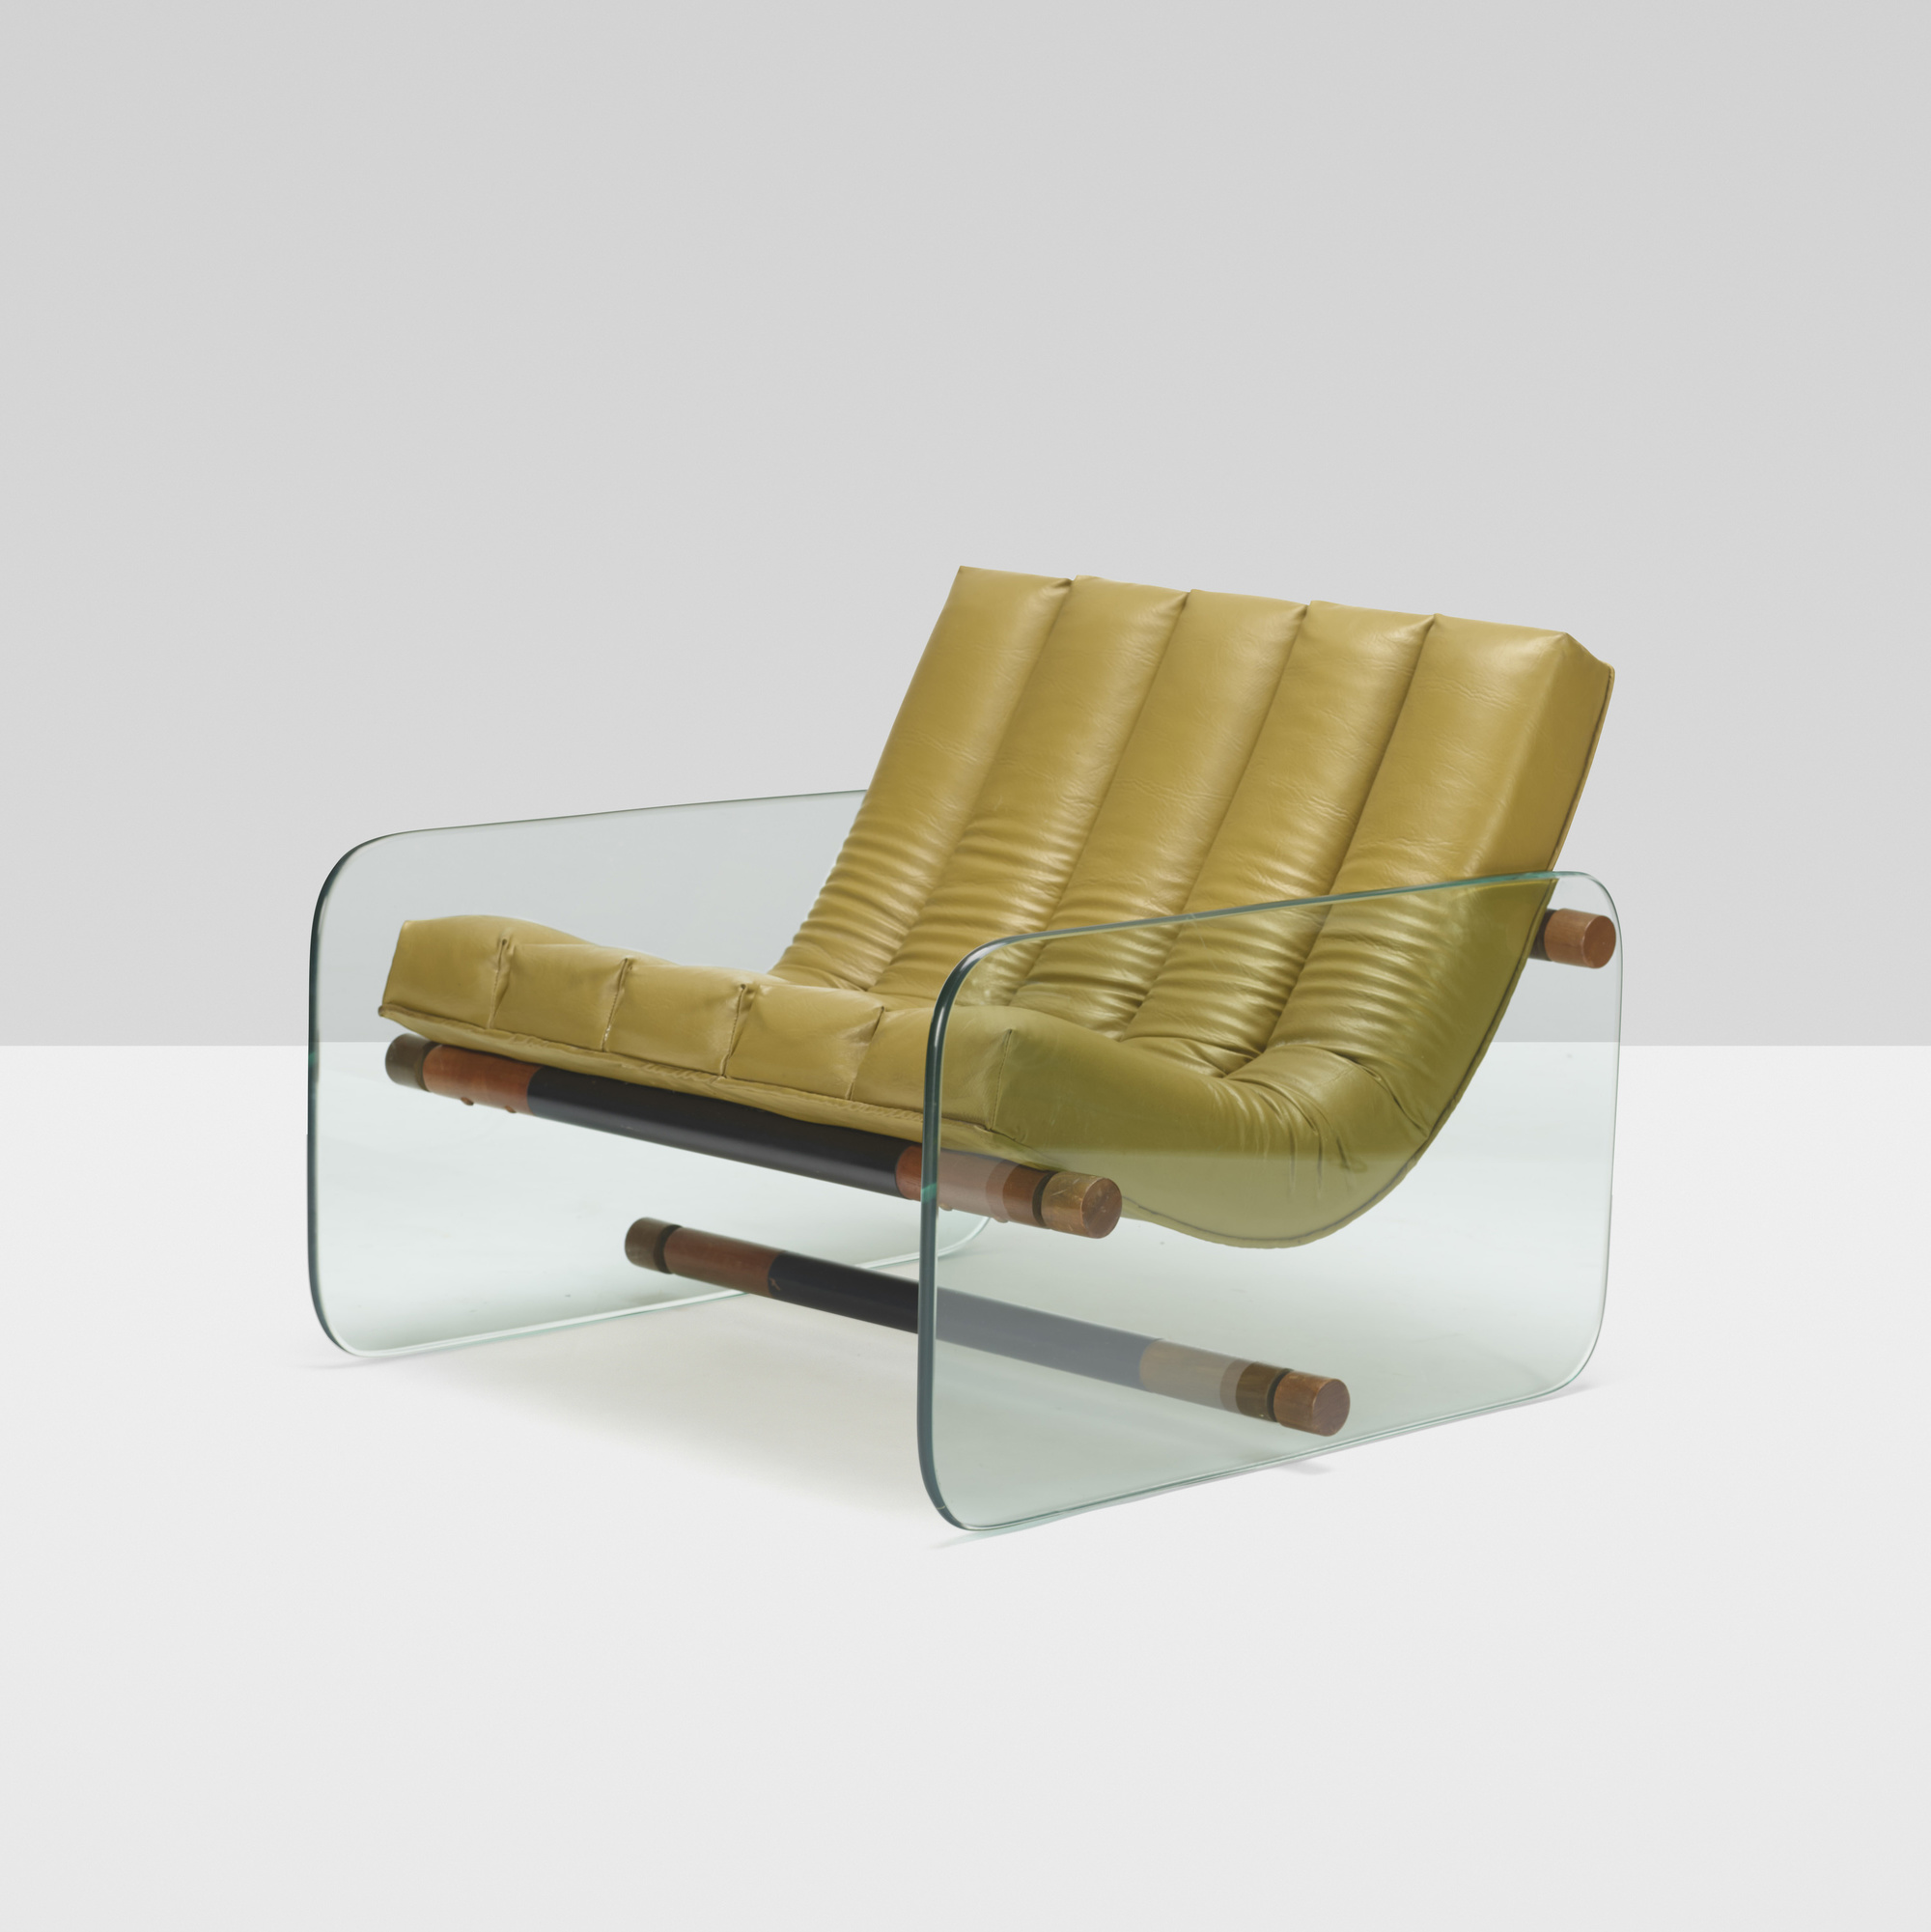 314: Fabio Lenci, attribution / lounge chair (1 of 2)